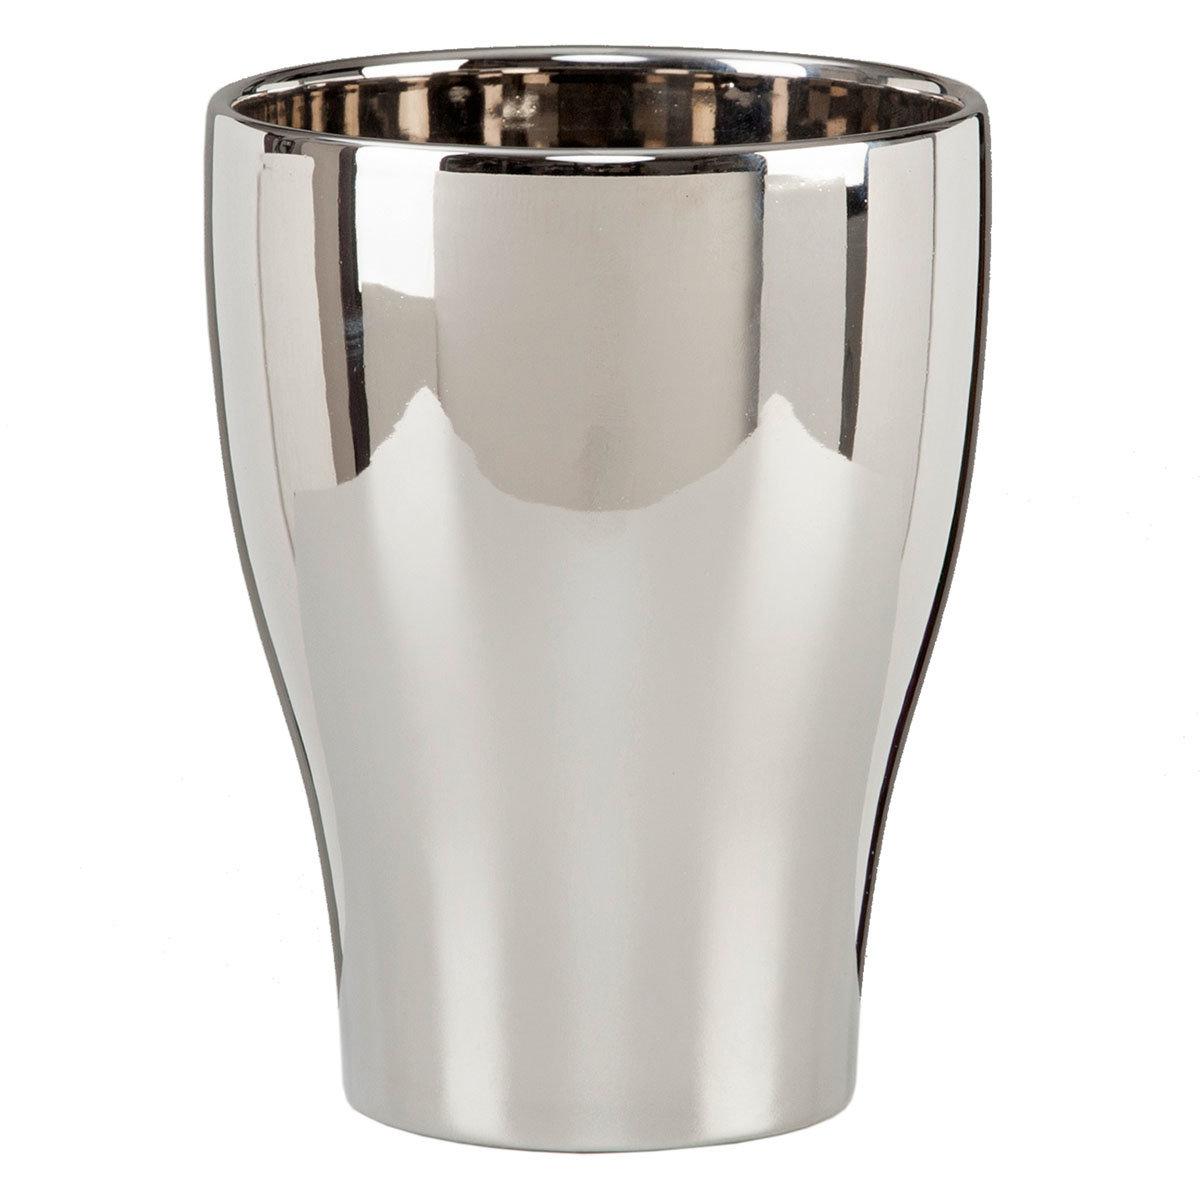 Keramik-Orchideengefäß, rund, 17,3x13,6x13,6 cm, silber